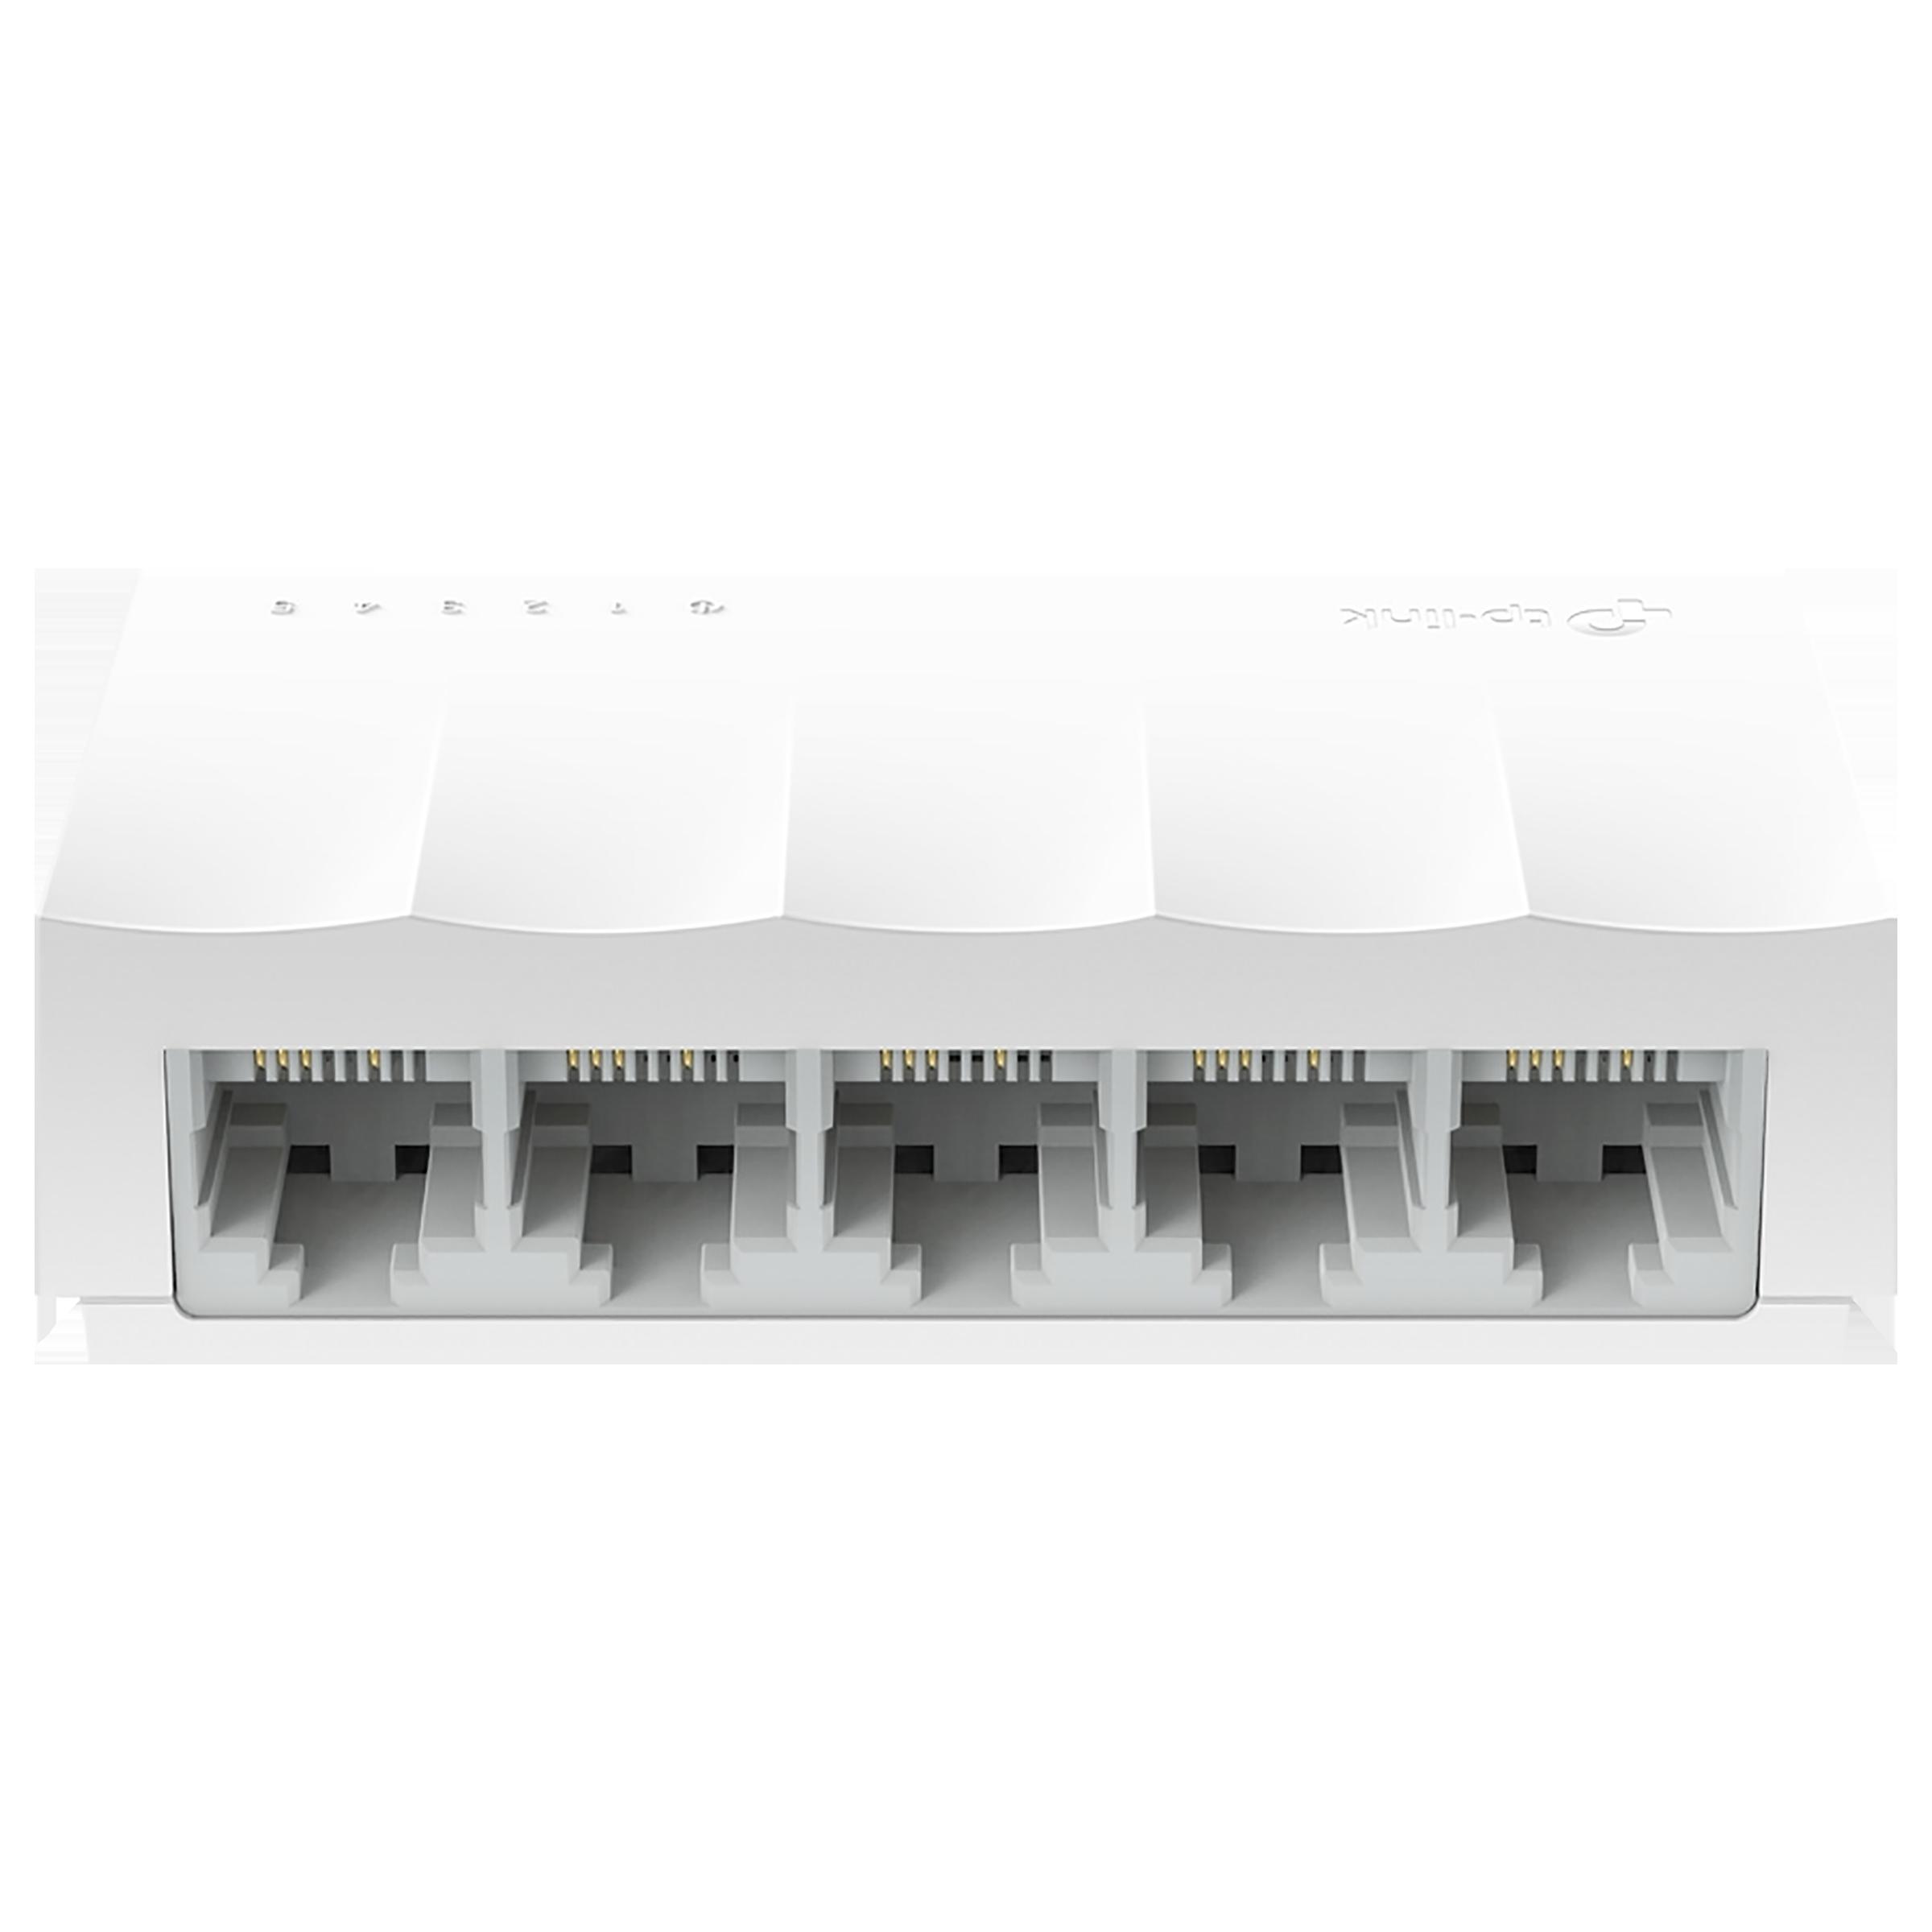 Tp-Link LS1005 Switch/Plug (Fanless Design, 1730502150, White)_1